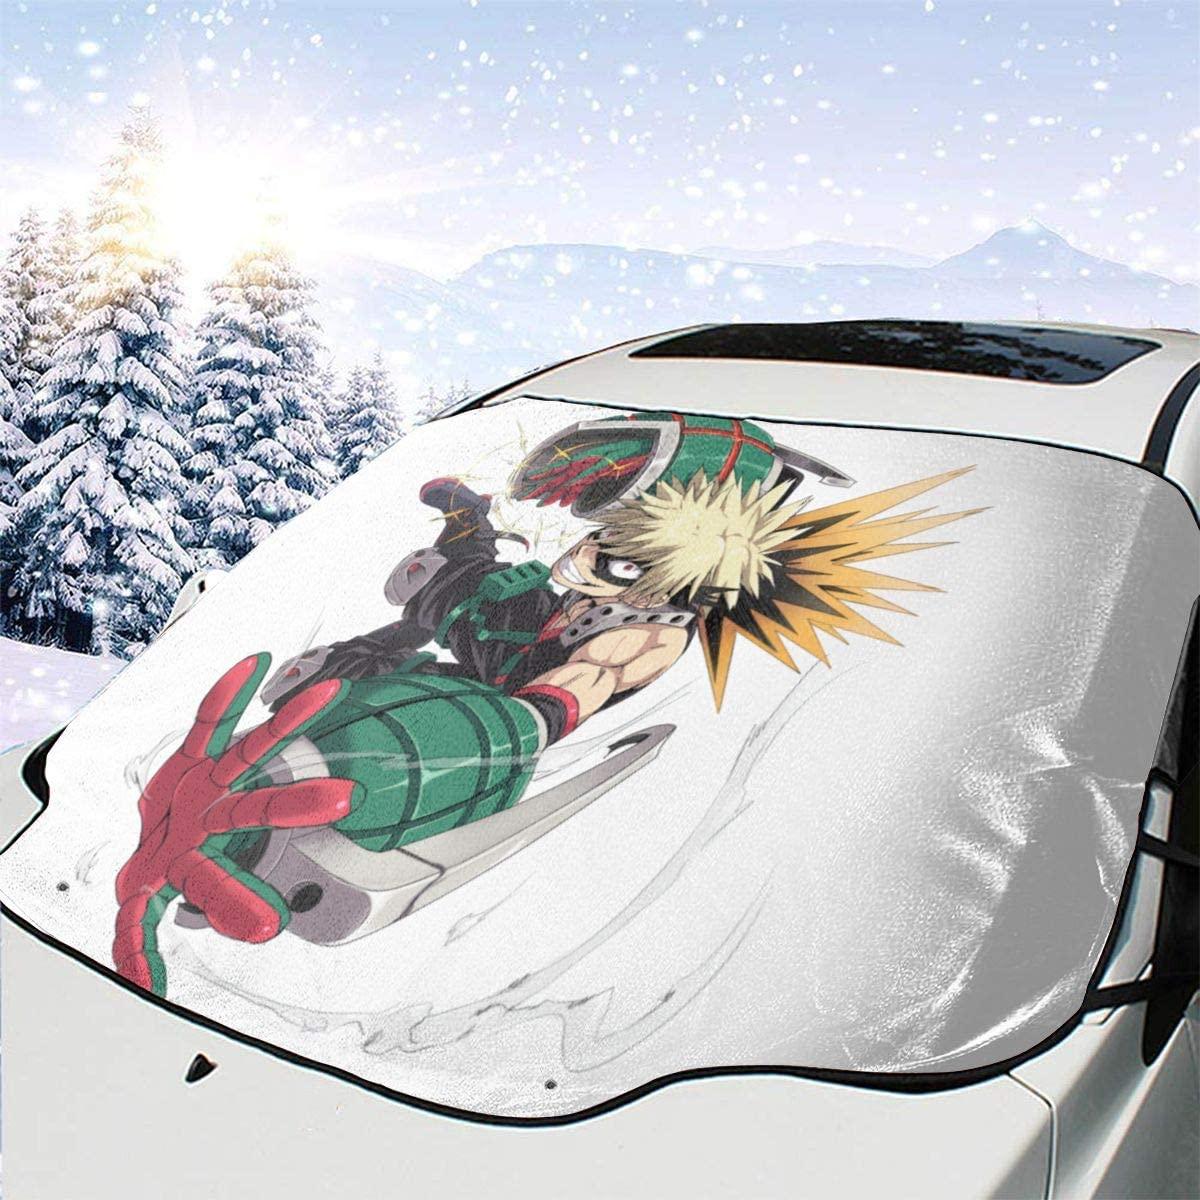 Car Windshield Snow Cover Japanese Anime My Hero Academia Bakugou Katsuki Large Waterproof Ice Removal Sun Shade Front Windshield Shade Glare Best Uv Ray Sun Visor Protector for Winter,Truck,Rvs